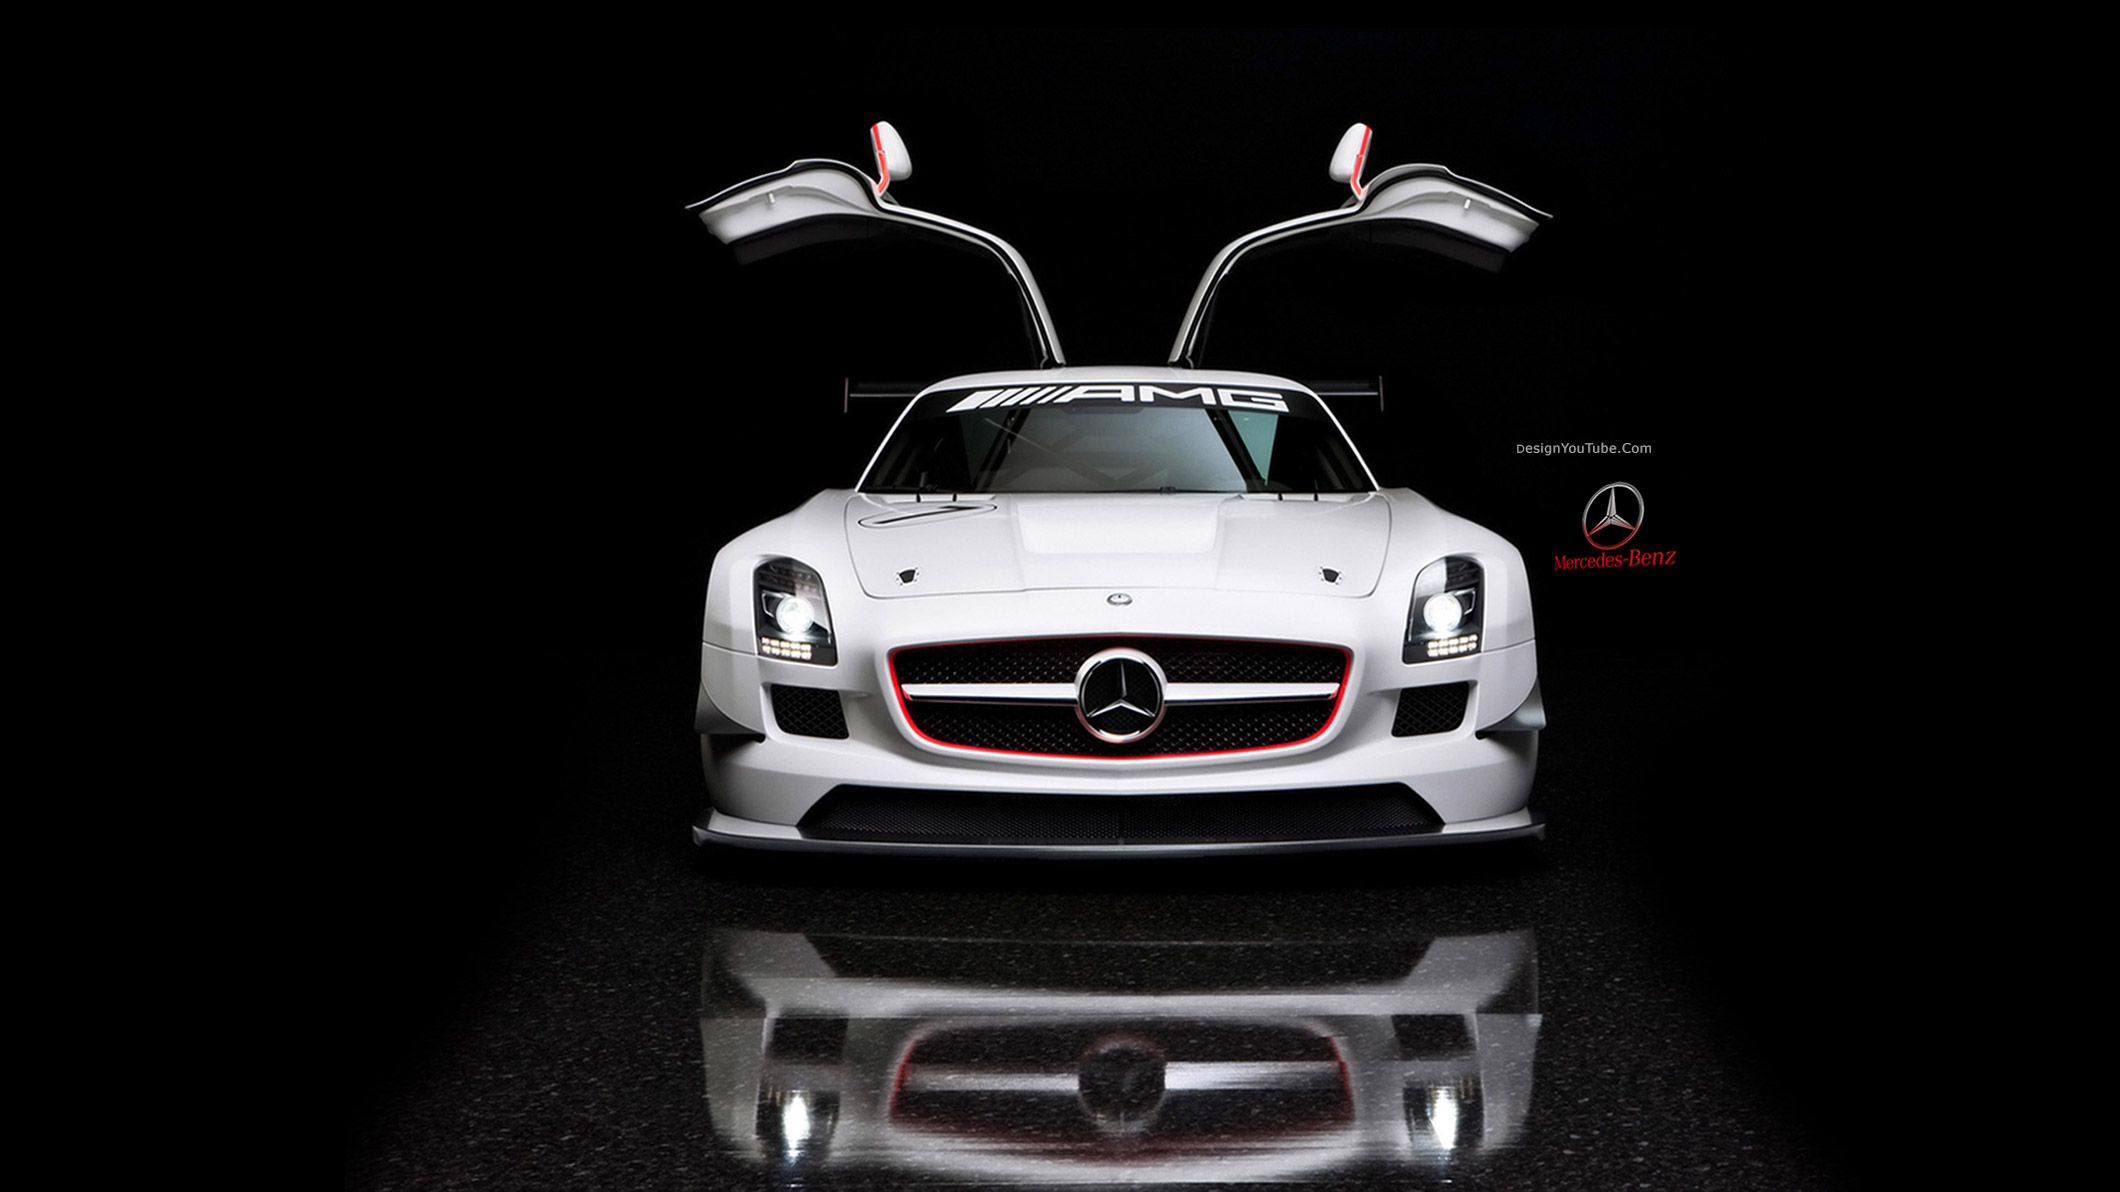 Mercedes benz google plus cover photo for Google mercedes benz